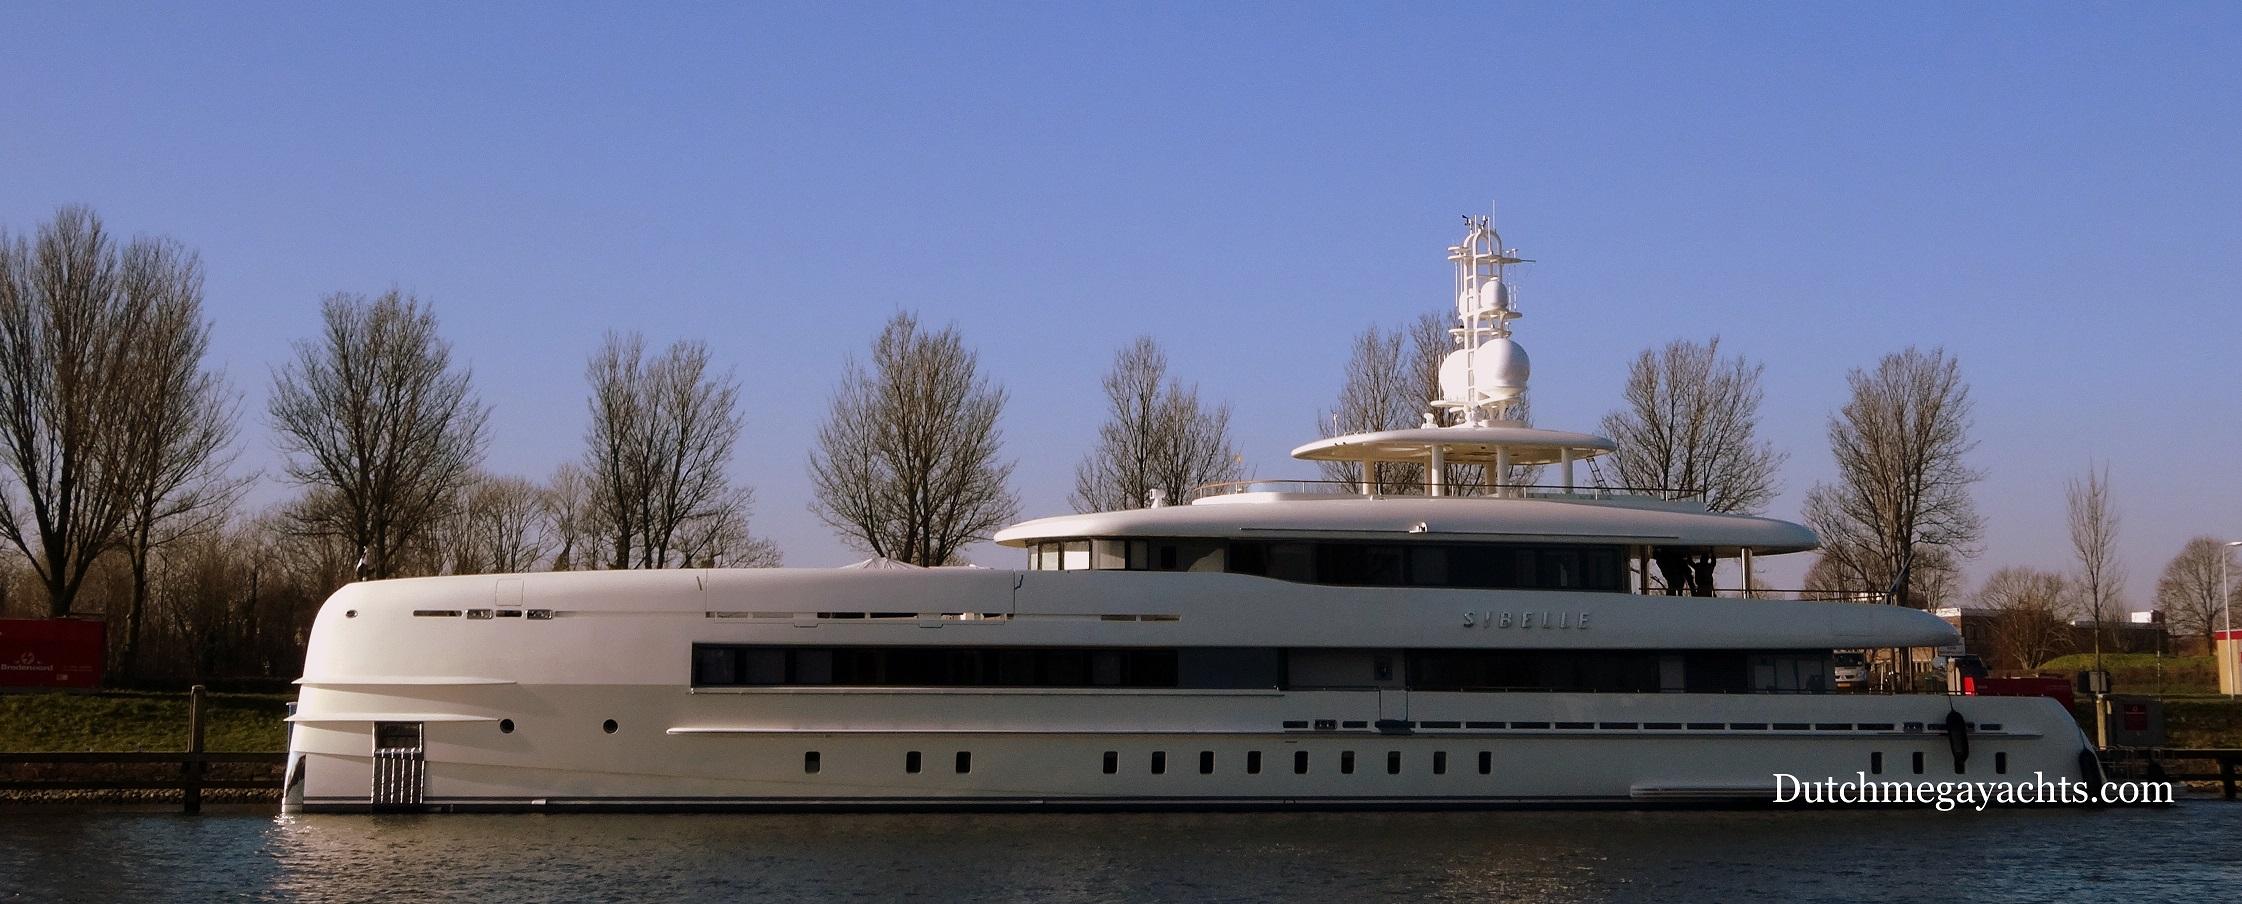 Super yacht SIBELLE